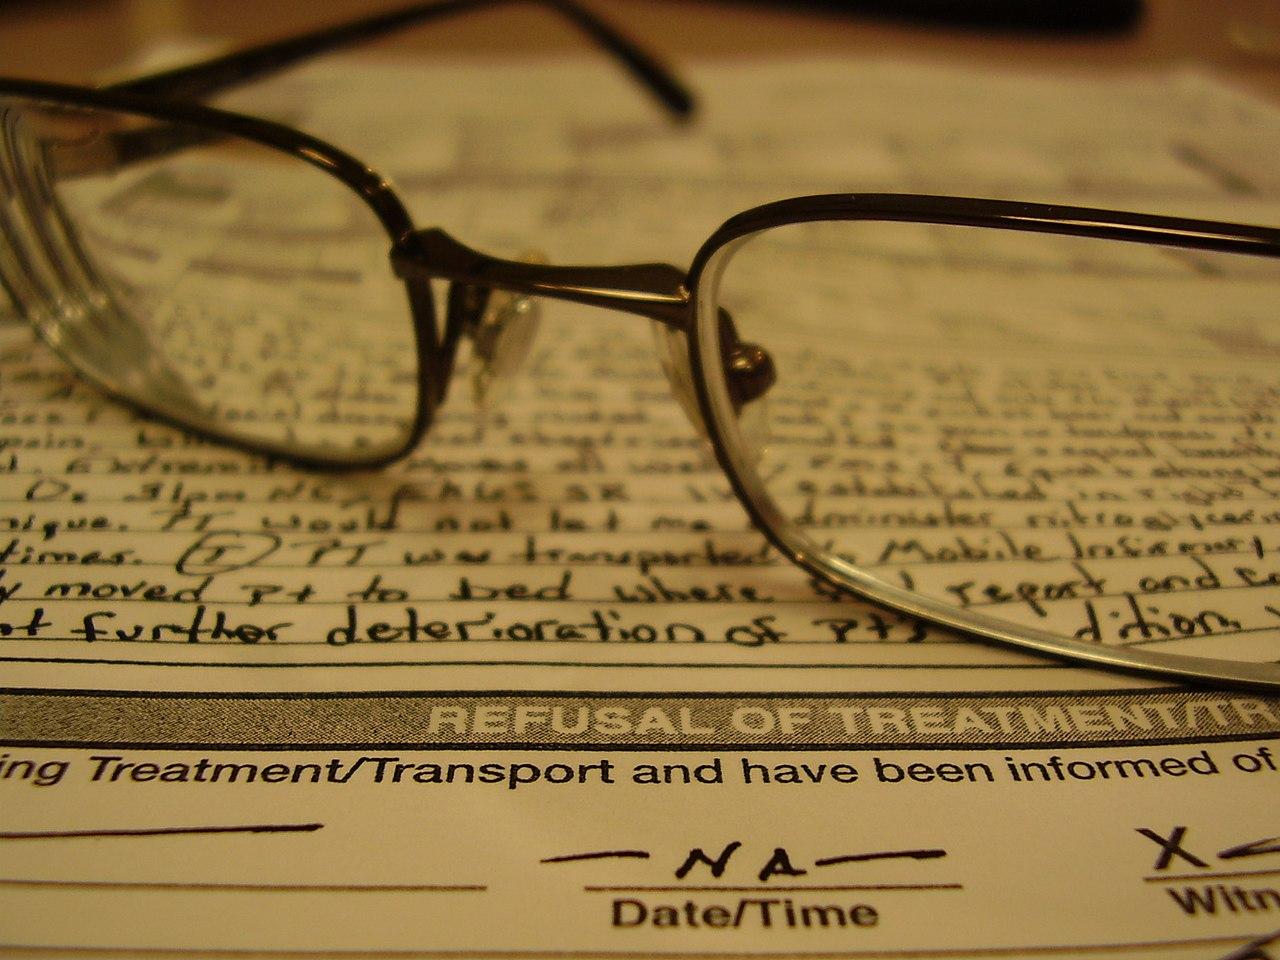 File:Refusal of treatment form.jpg - Wikimedia Commons